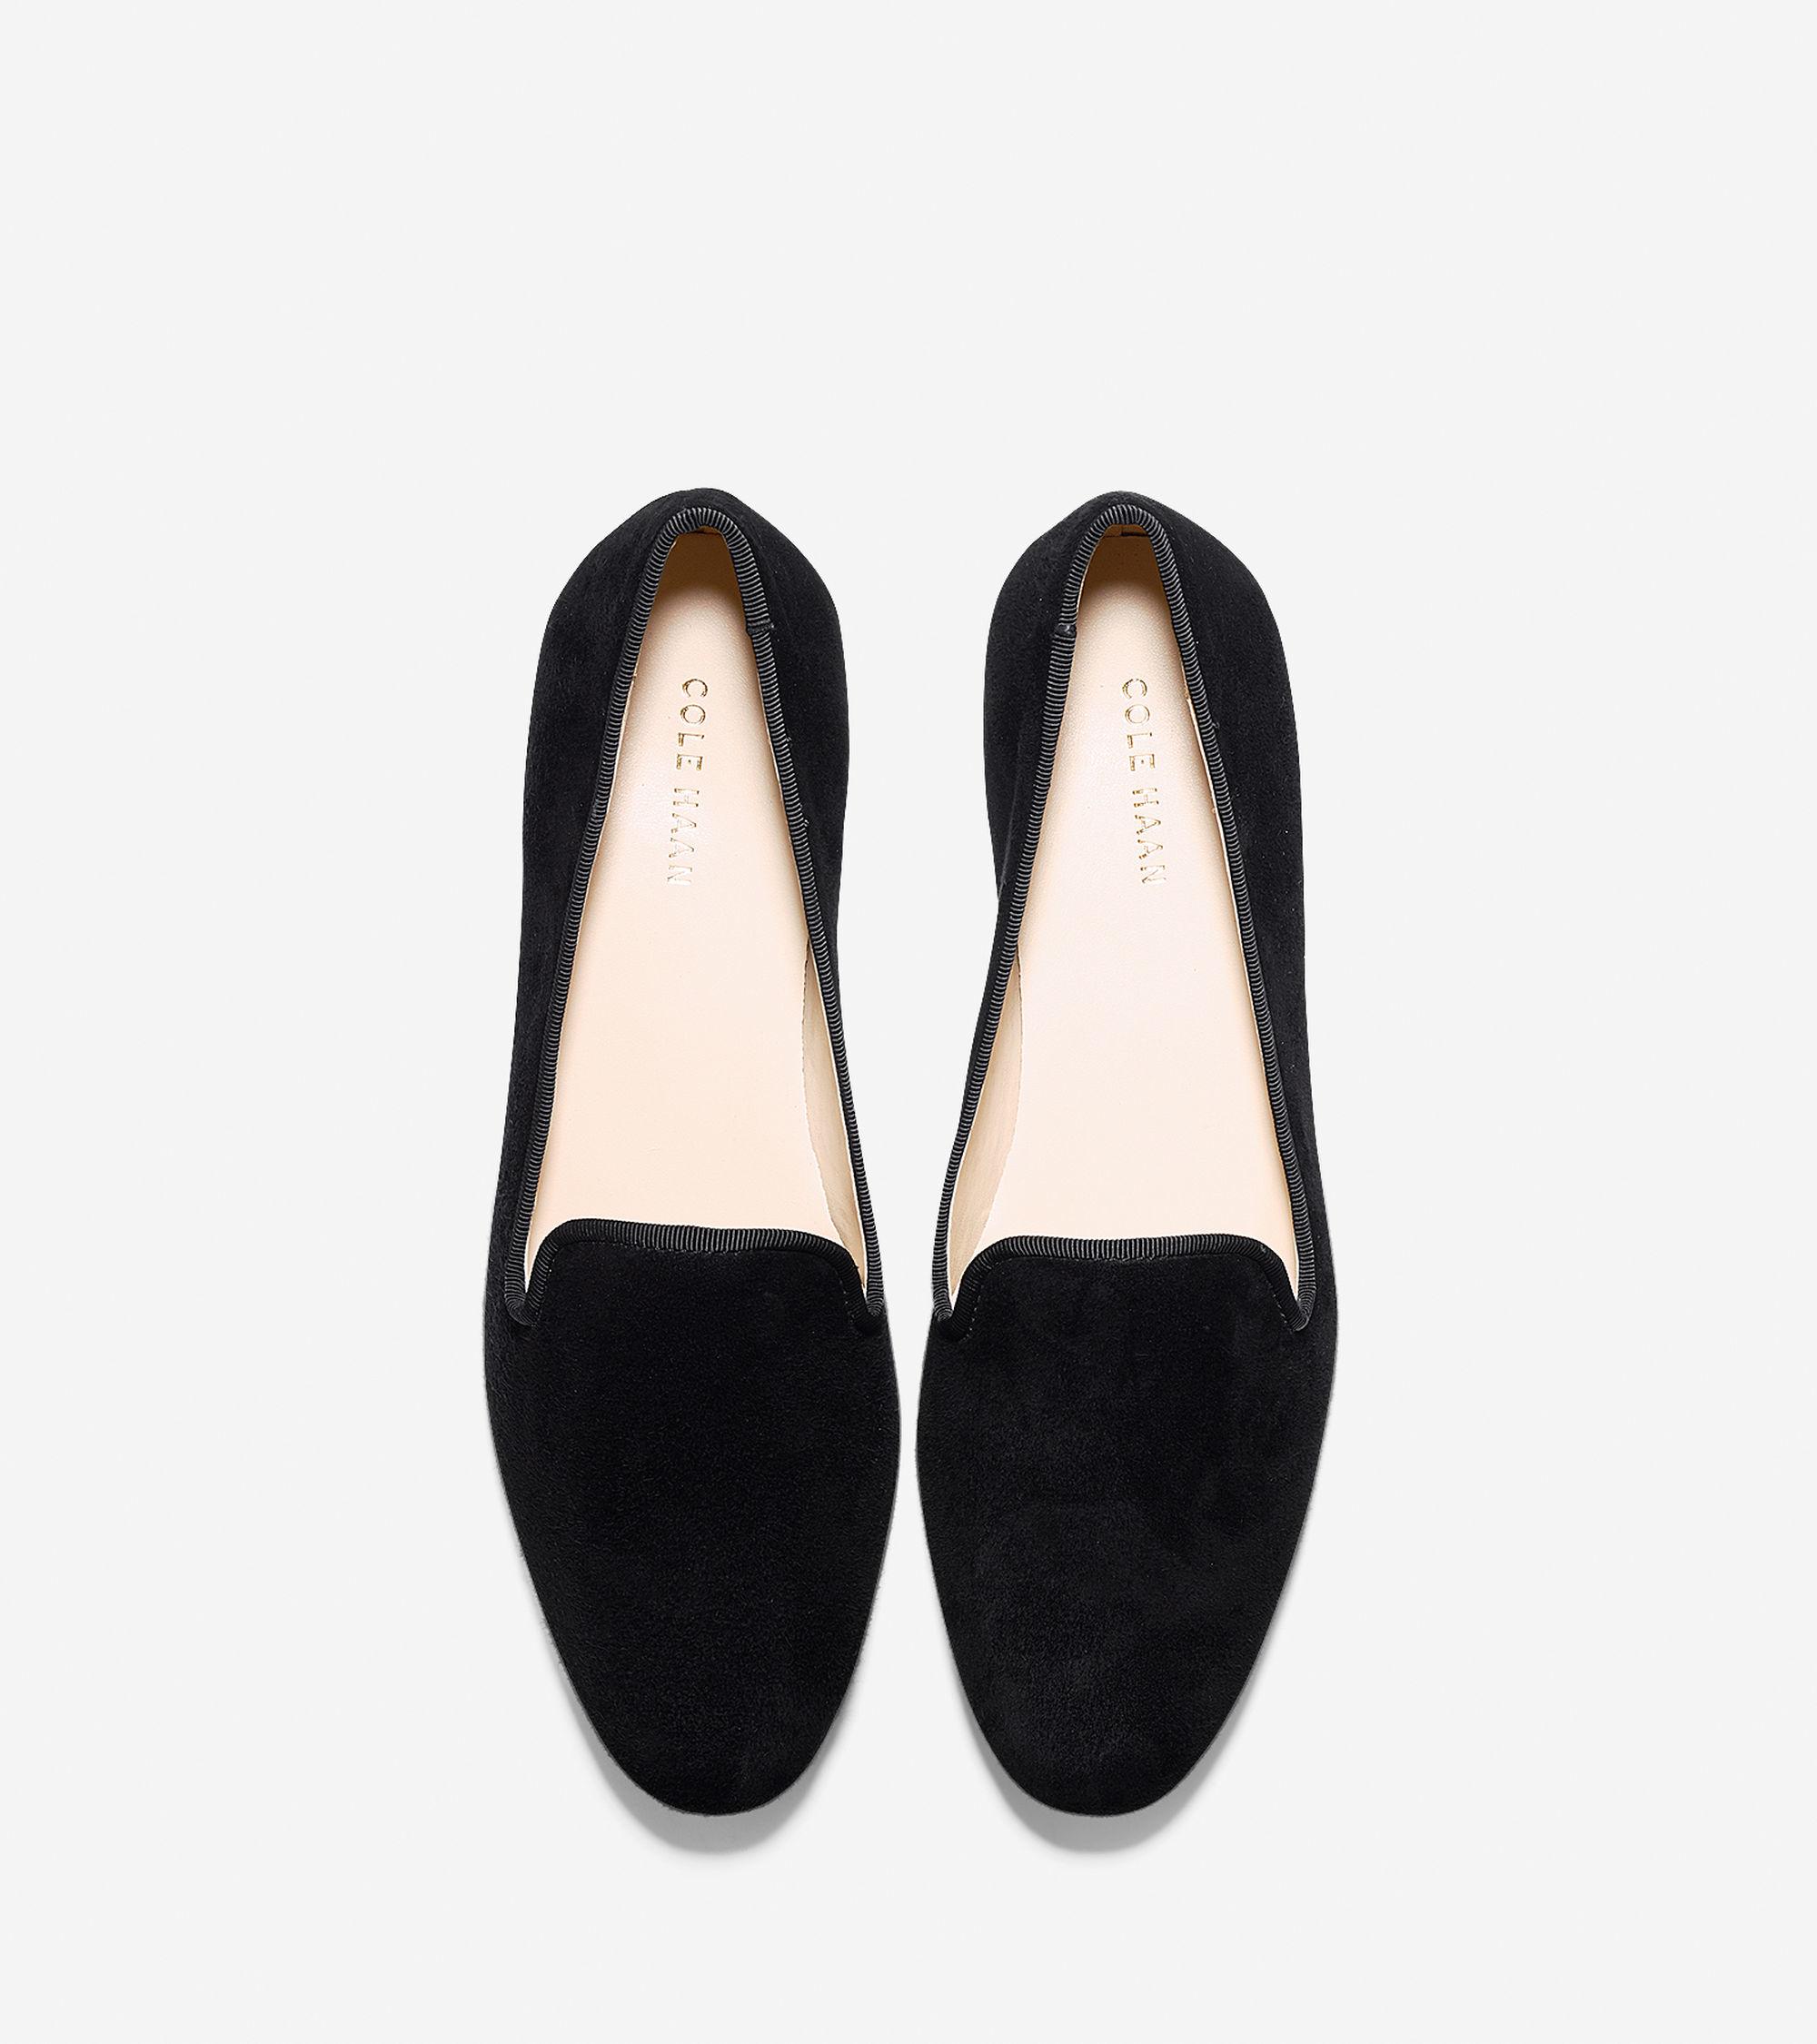 Naturalizer Shoes Black Suede